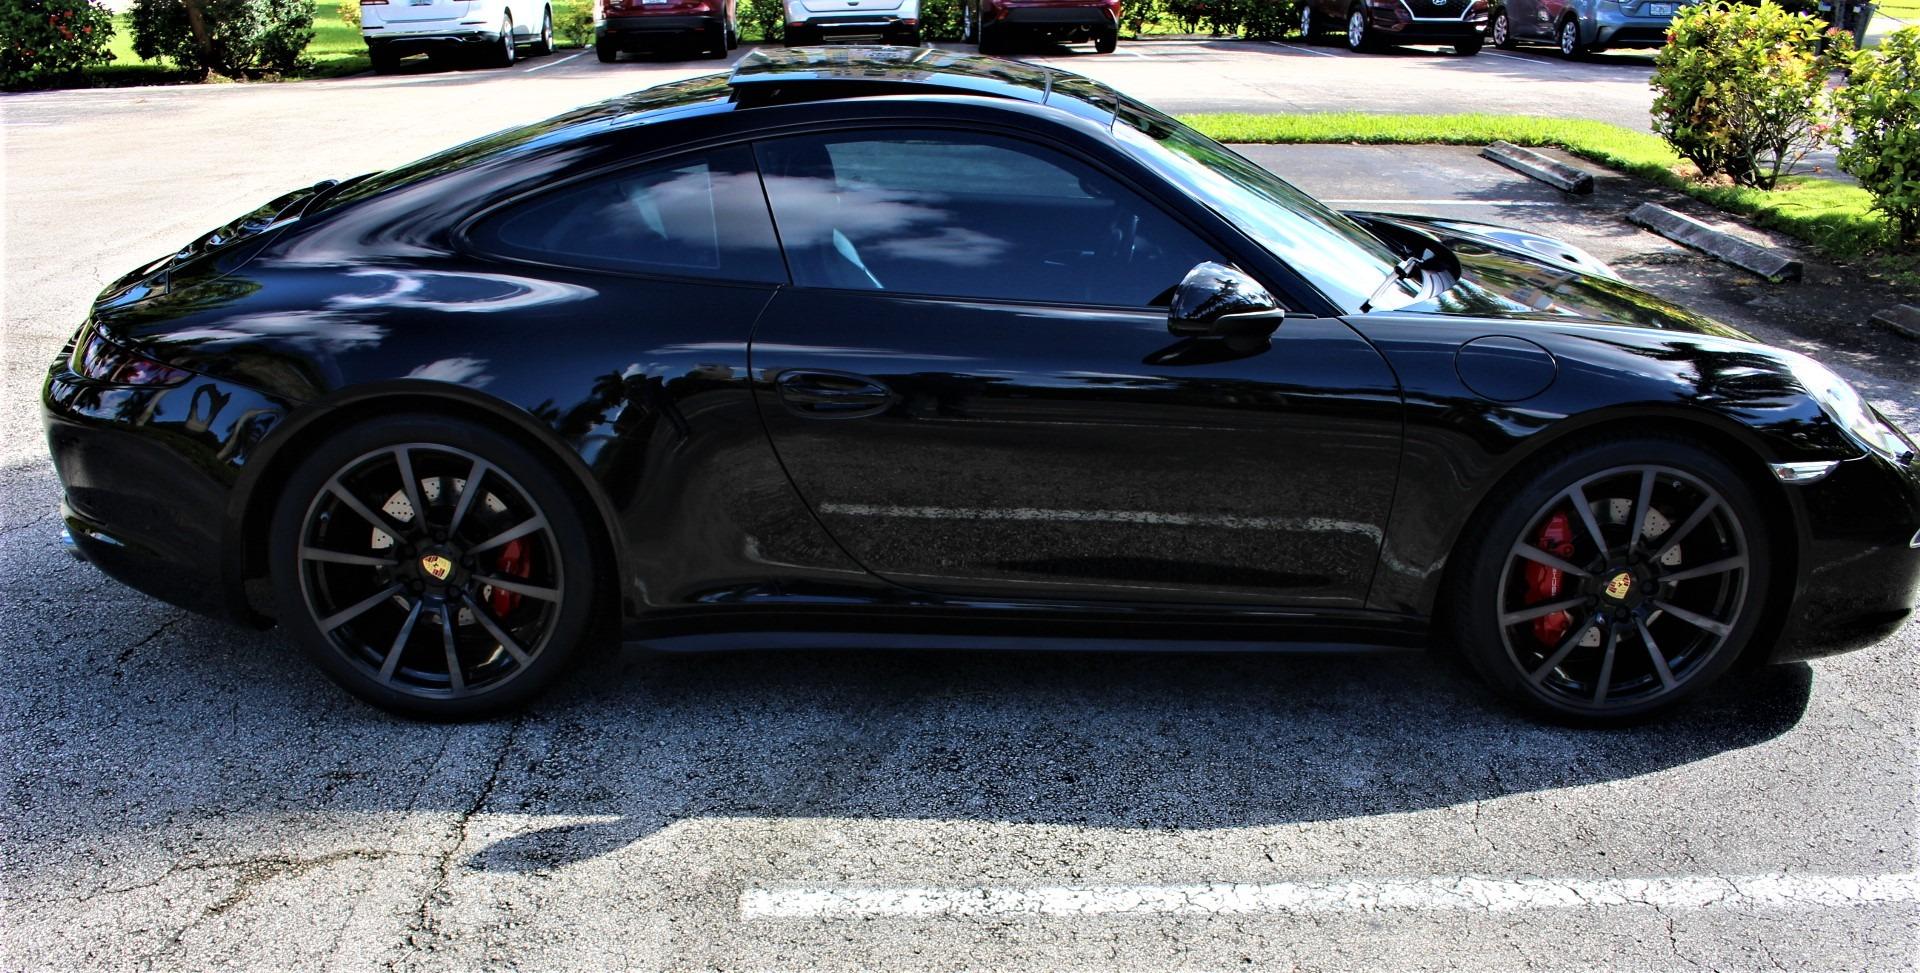 Used 2013 Porsche 911 Carrera 4S for sale $84,850 at The Gables Sports Cars in Miami FL 33146 4